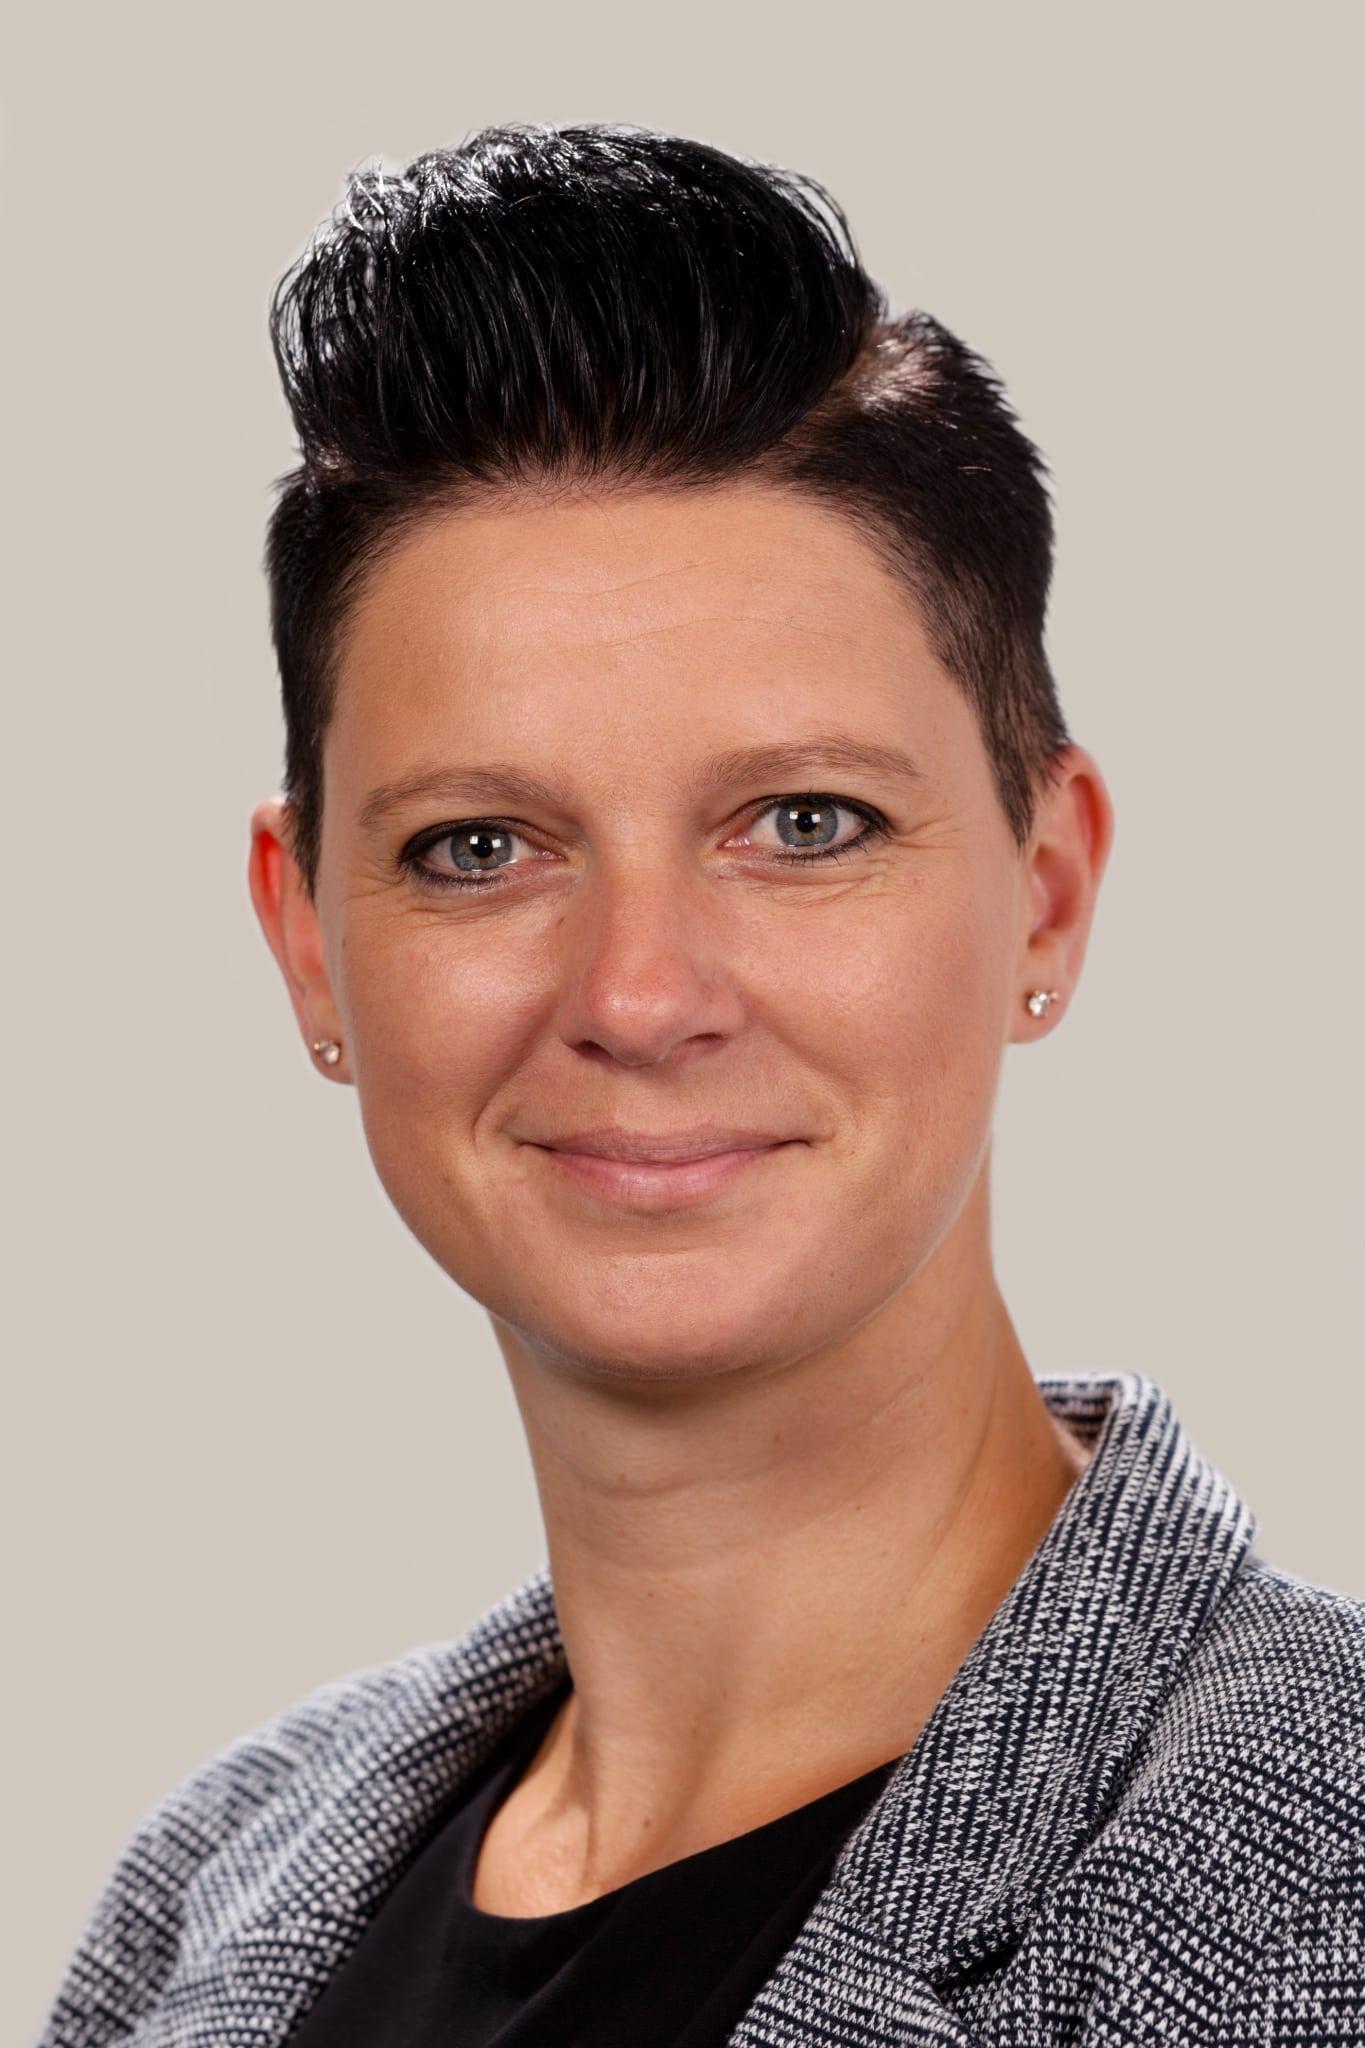 Harmpke Mölenberg-Kluinhaar